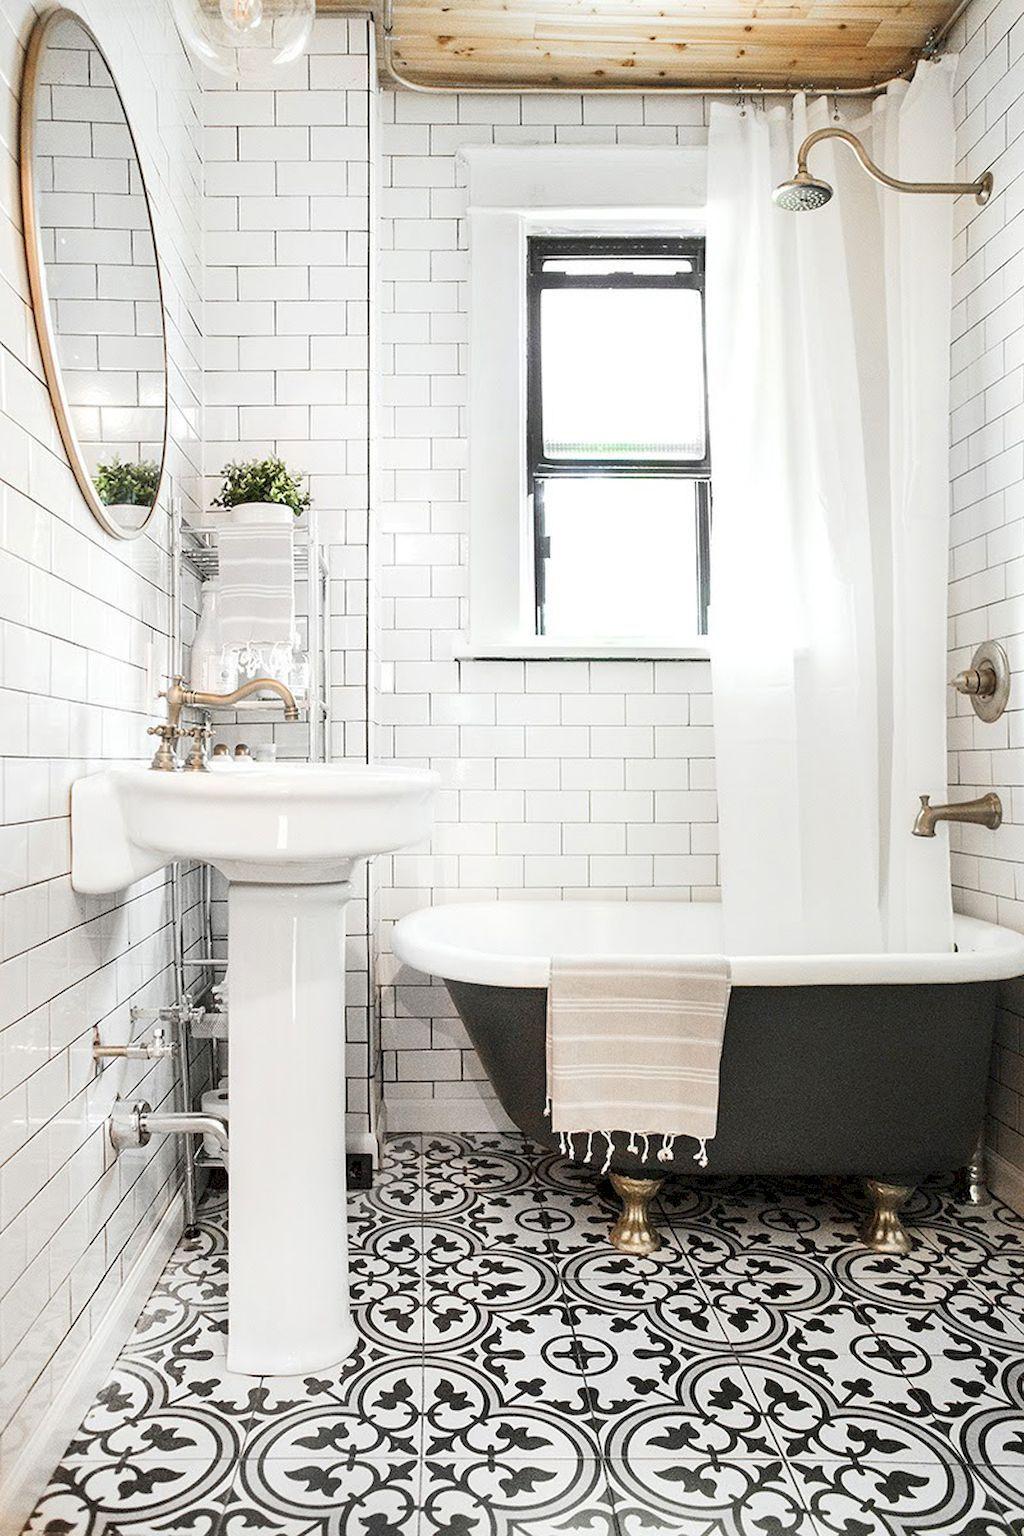 60 Small Master Bathroom Tile Makeover Design Ideas | Subway tiles ...